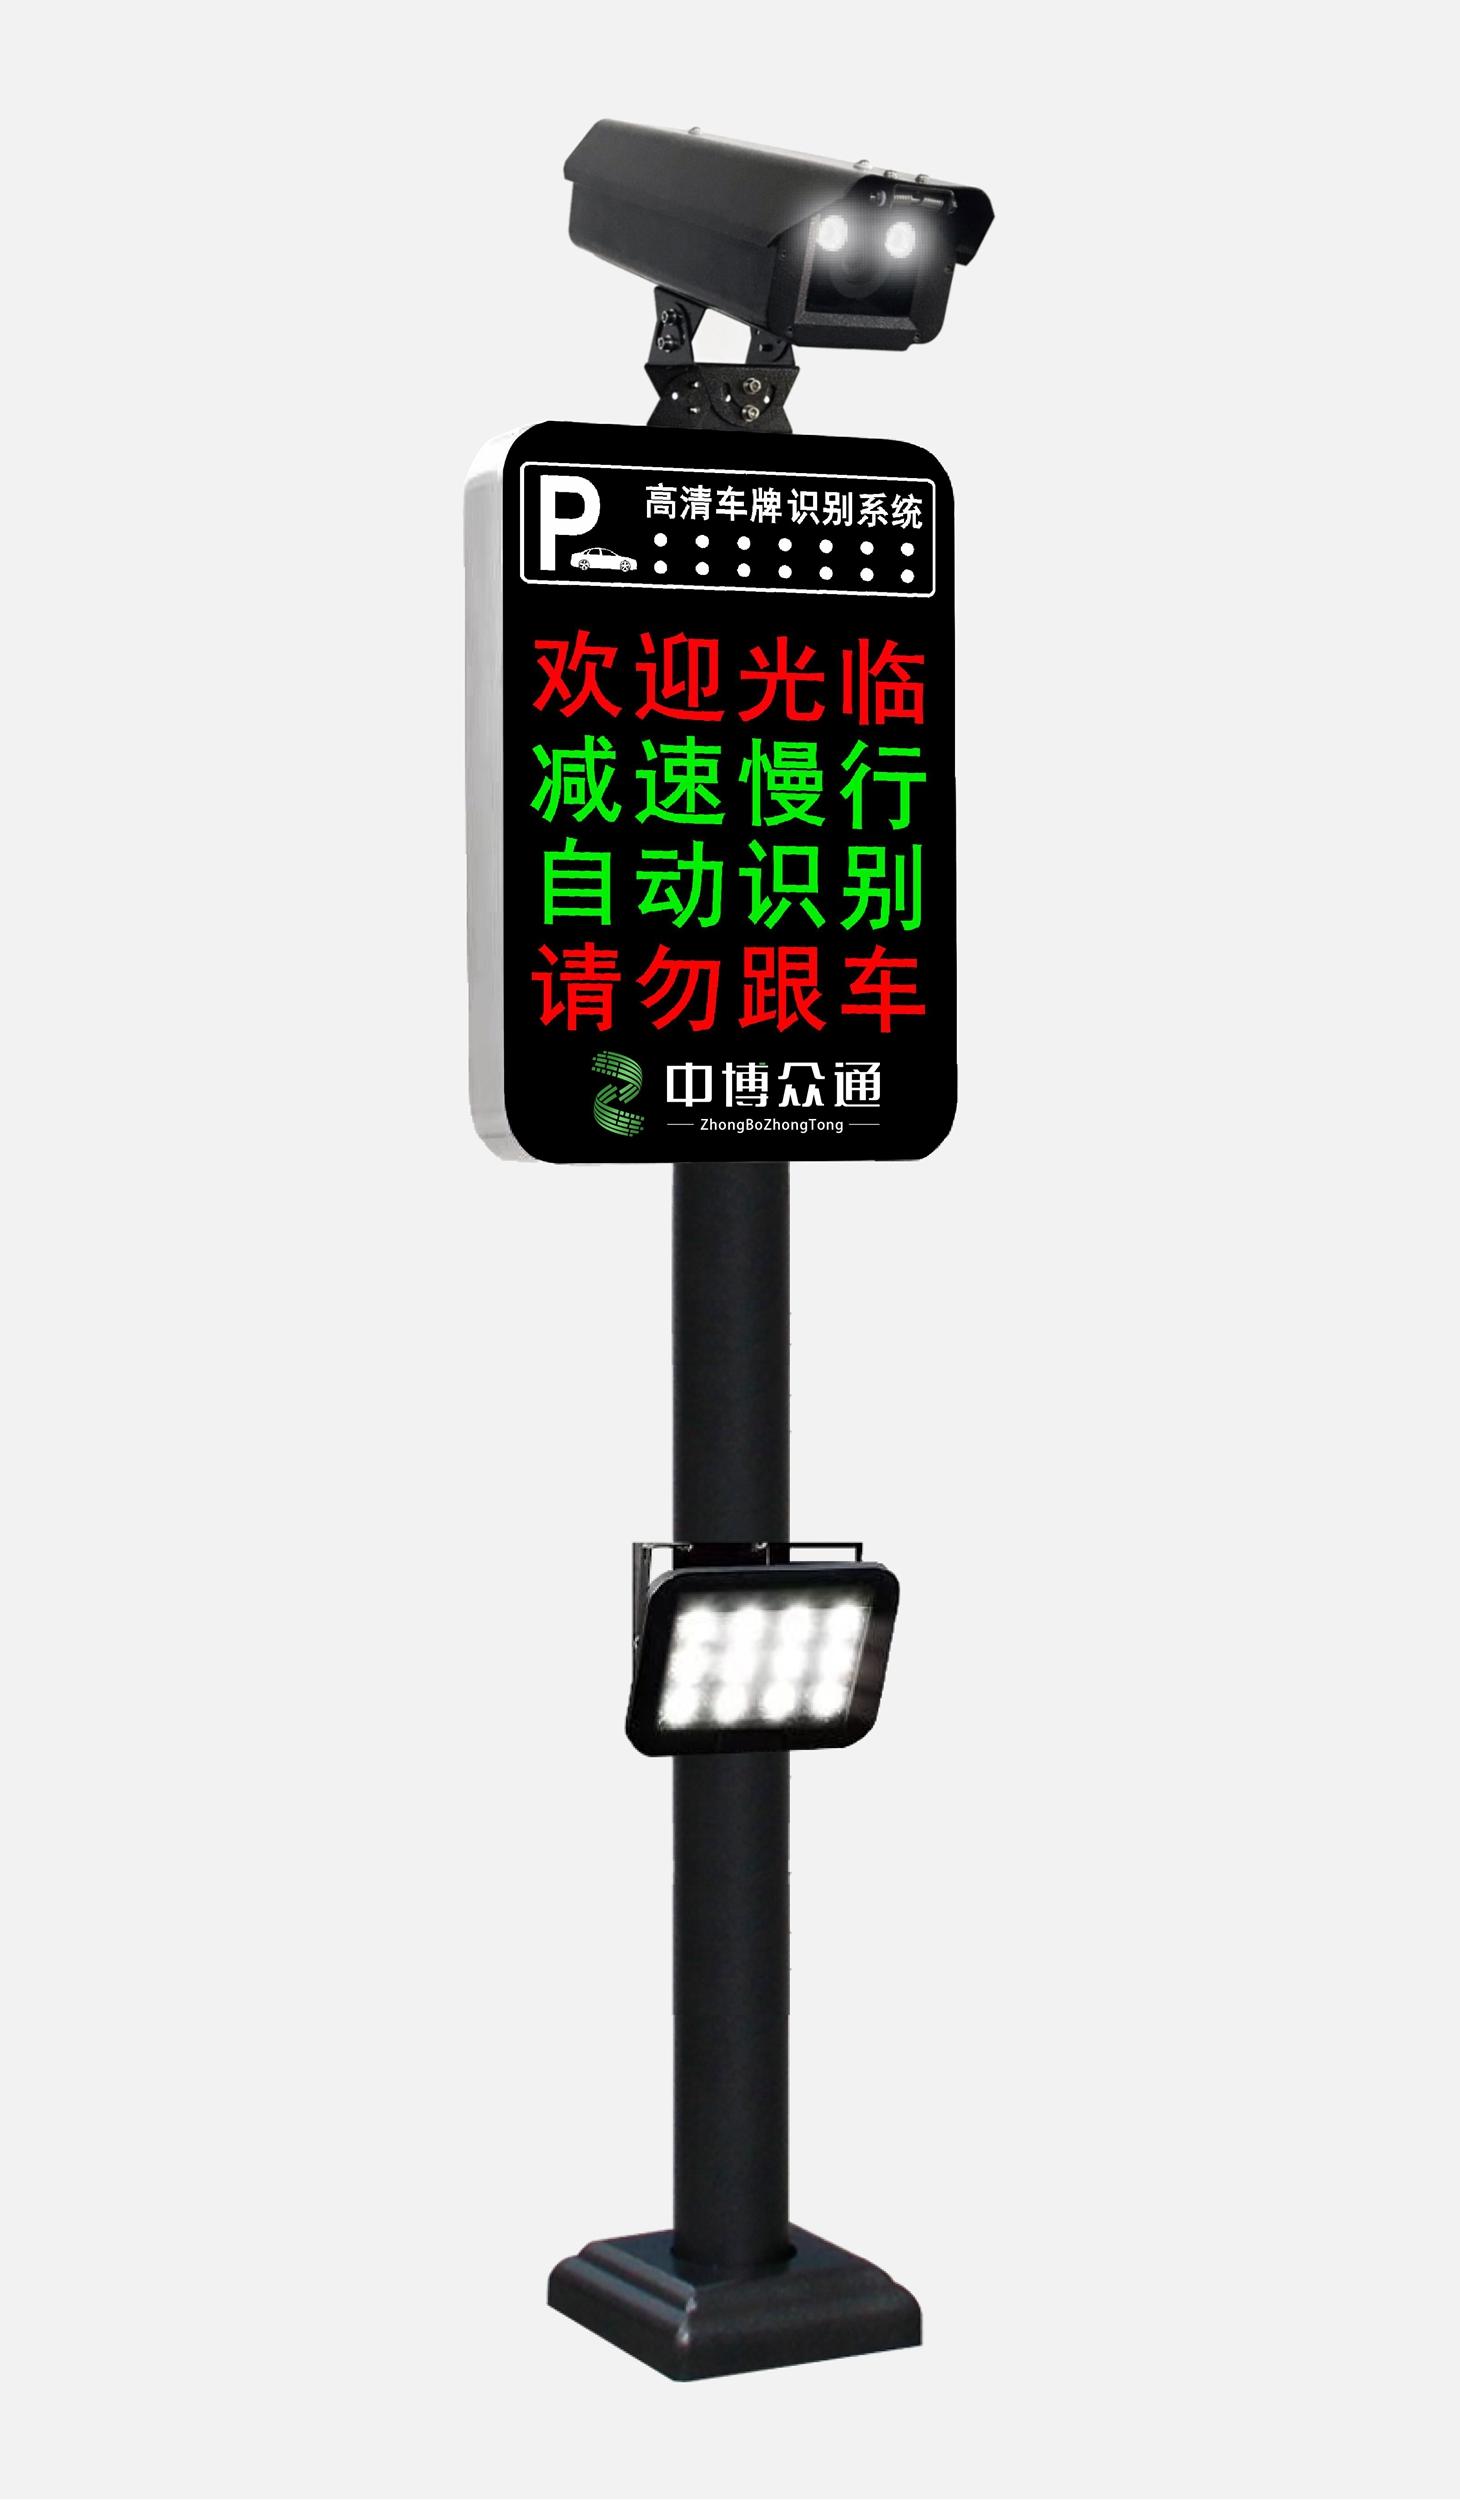 中博众通ZBSPR-70